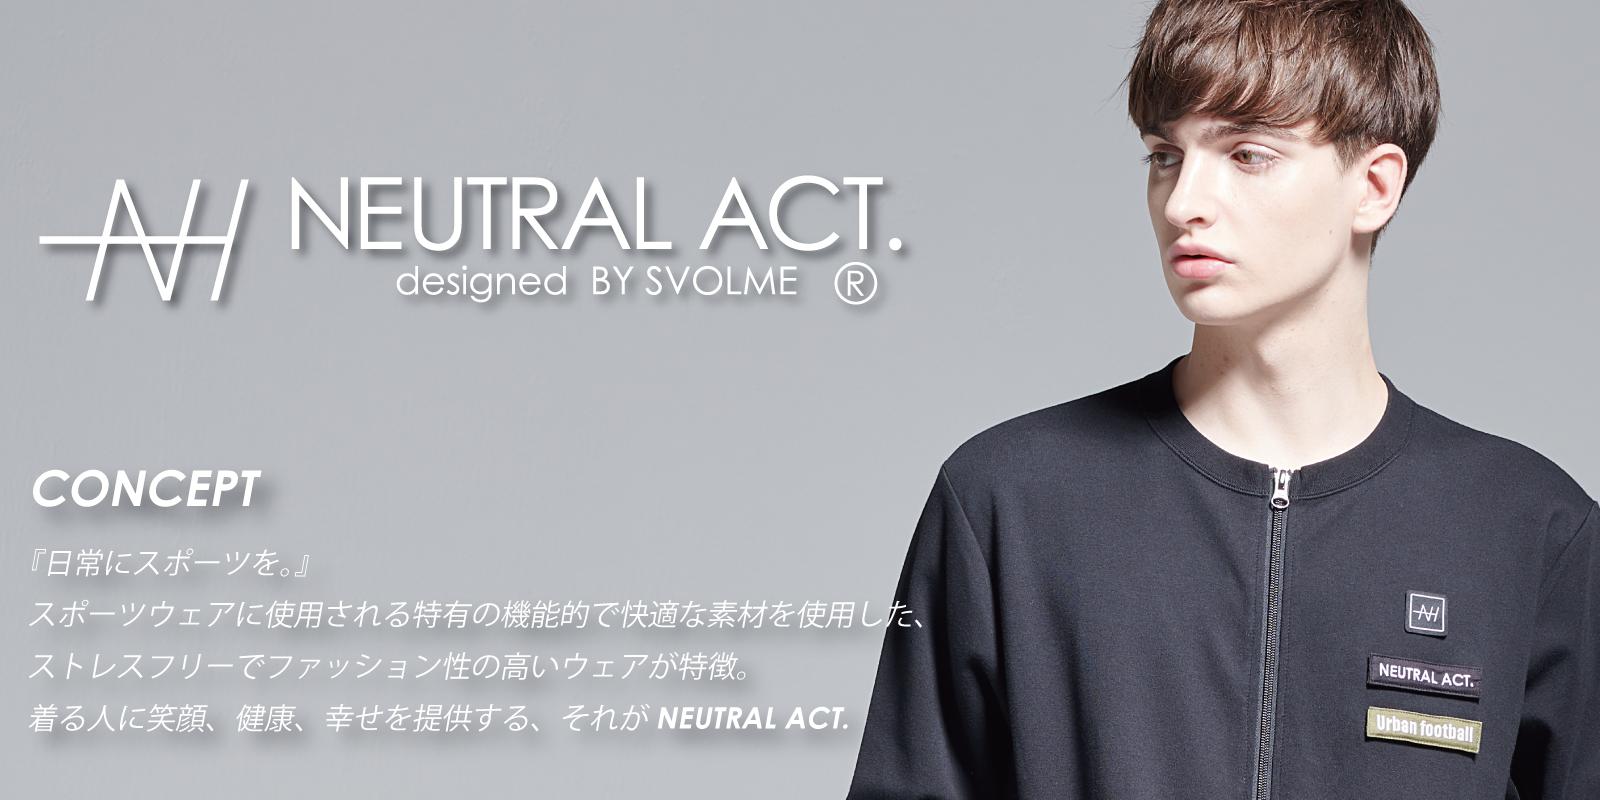 NEUTRAL ACT.が Kemari87KISHISPO心斎橋店で取り扱い開始!!